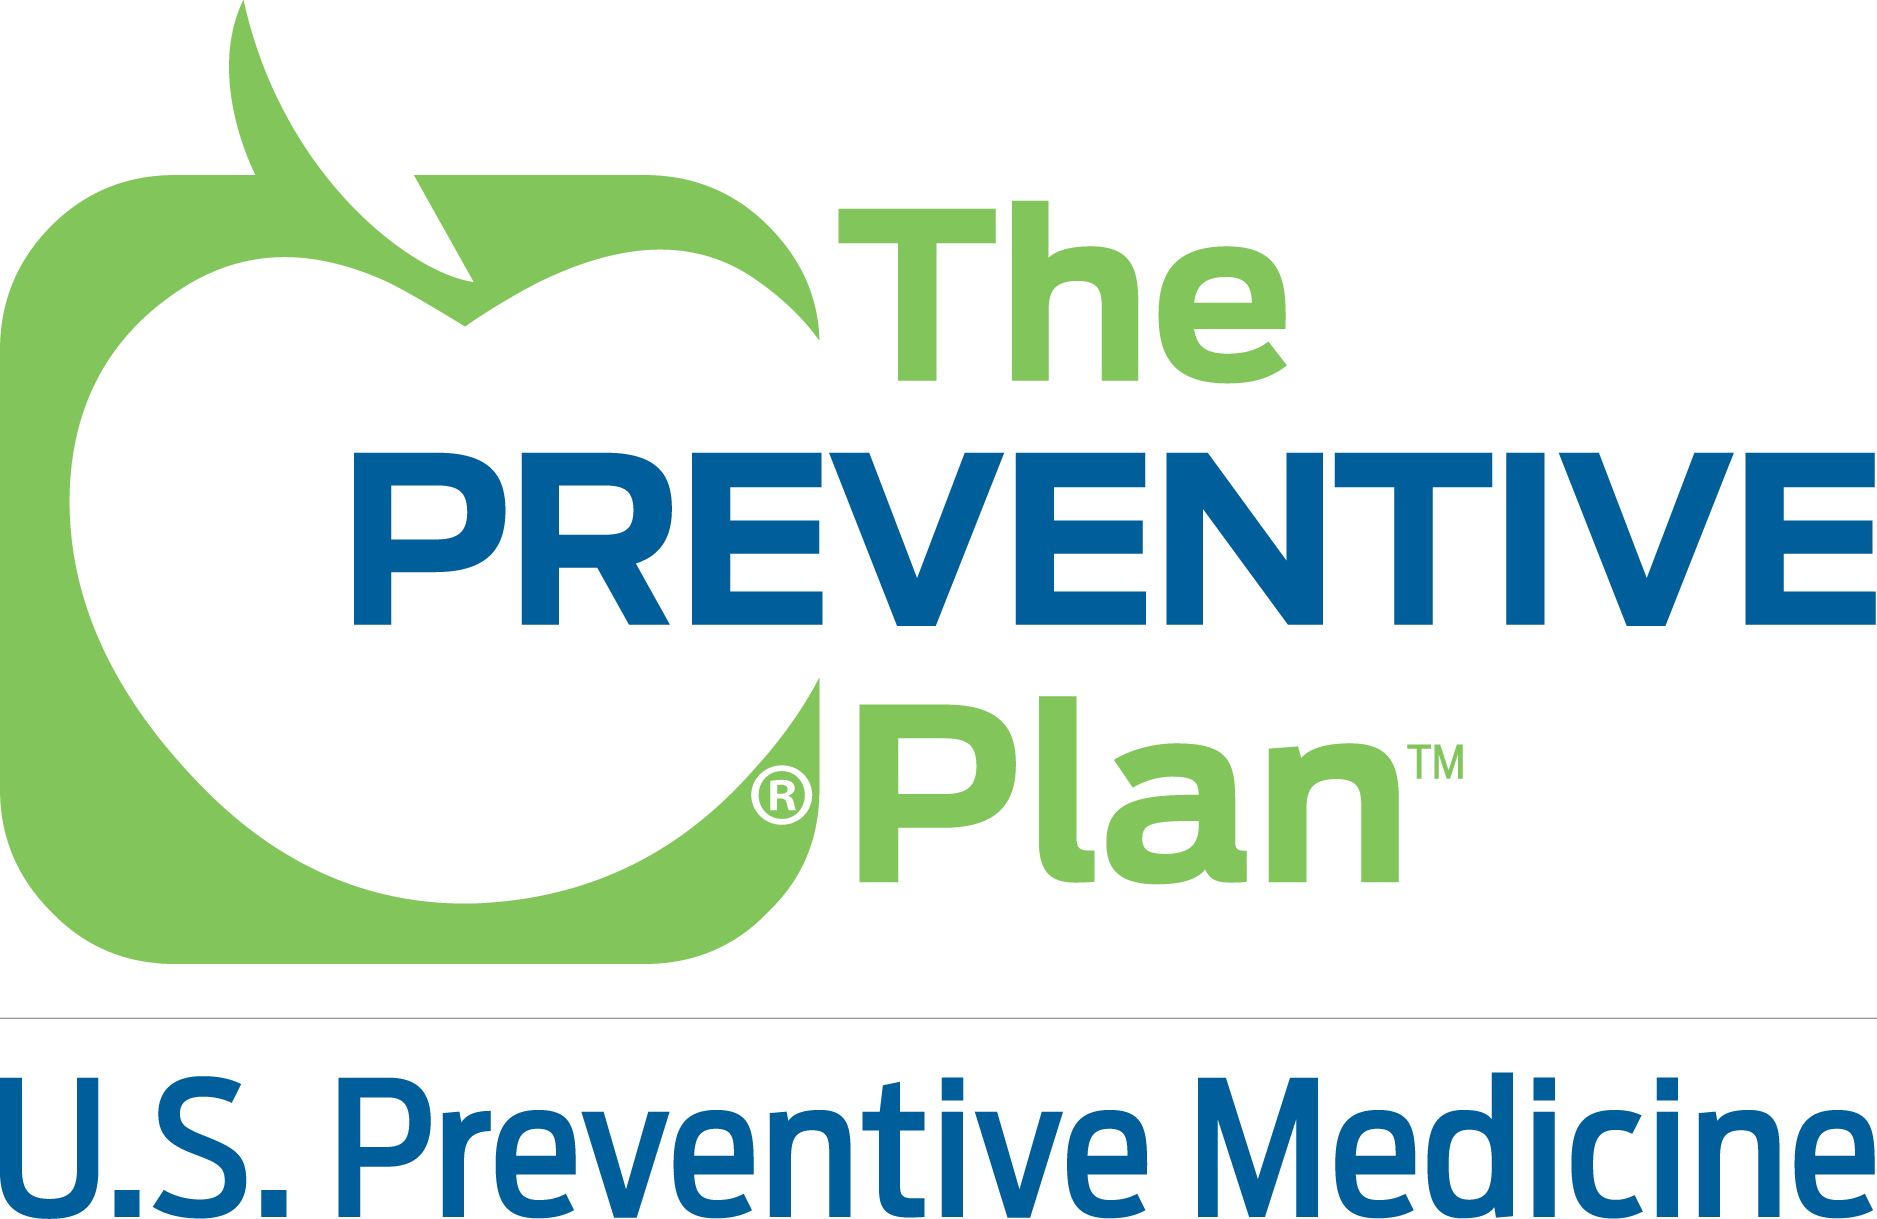 U.S. Preventive Medicine, Inc.